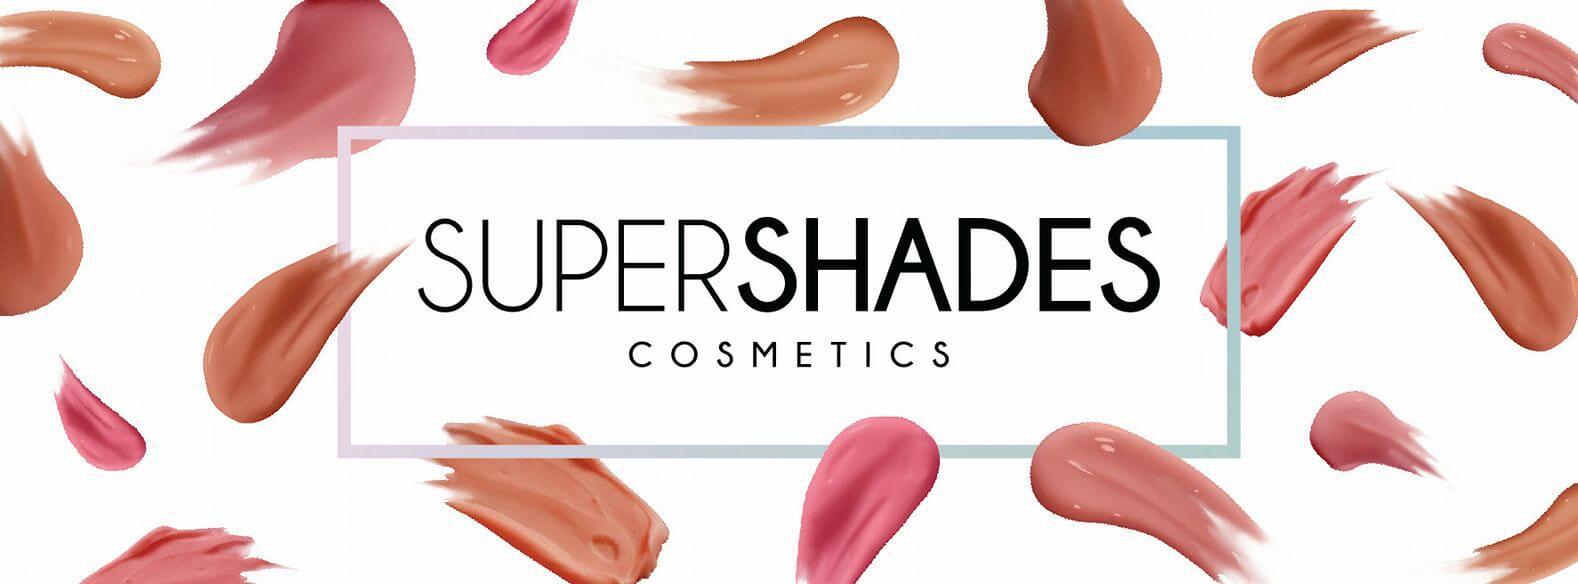 Supershades,Supershades Galaxy Tint ,Supershades Galaxy Tint #GT01 SUN CLAY,Supershades Galaxy Tint #SUN CLAY,Supershades Galaxy Tintราคา,Supershades Galaxy Tint รีวิว,Supershades Galaxy Tintซื้อได้ที่